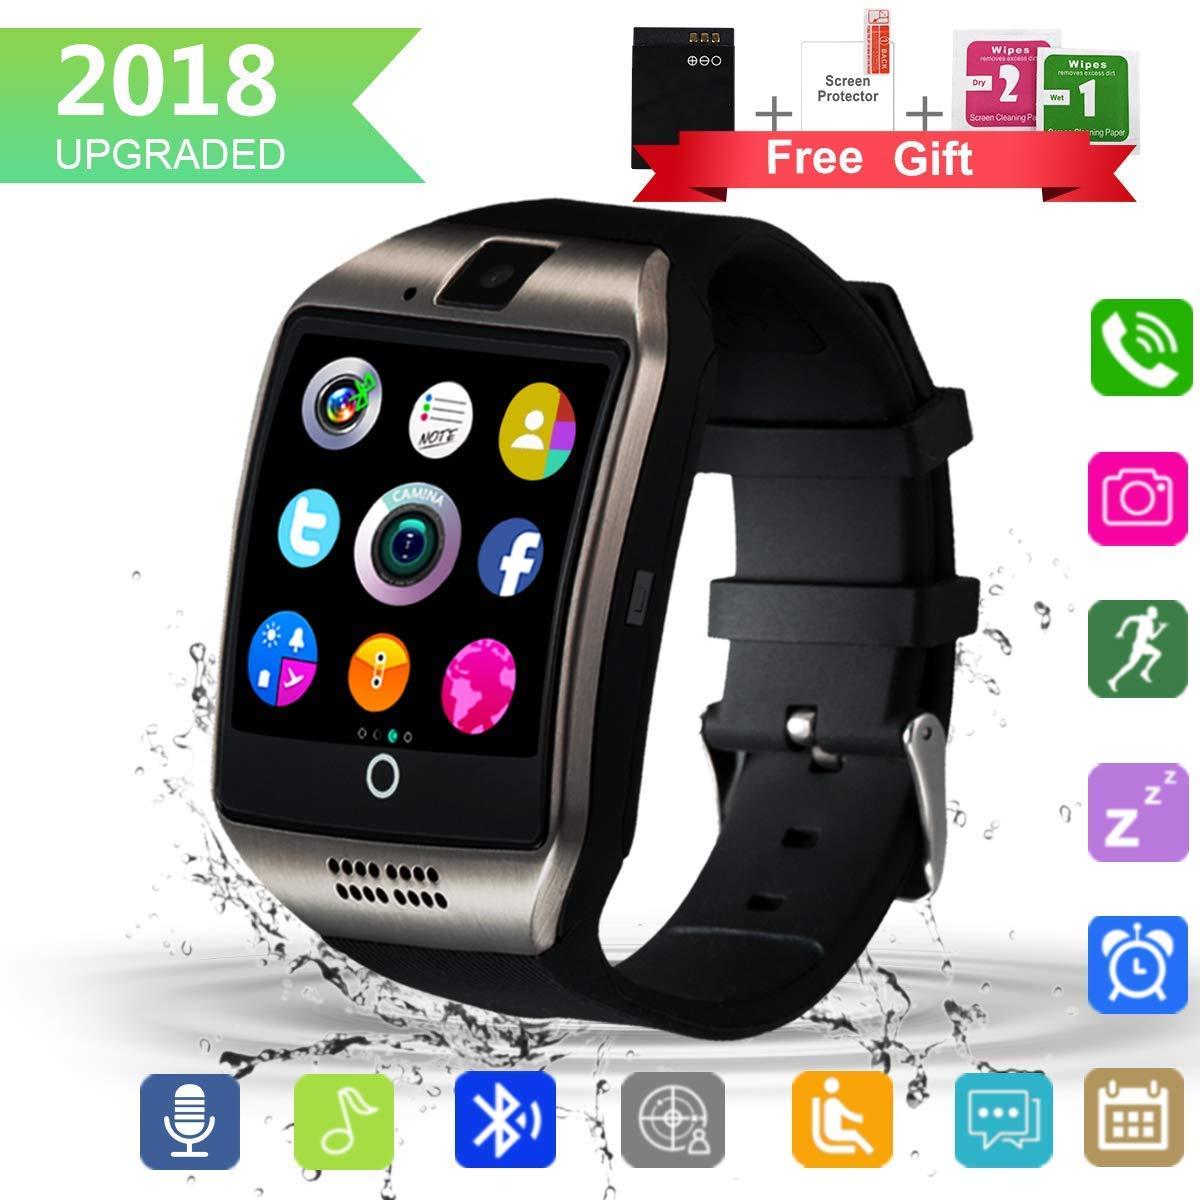 Smartwatch, Impermeable Reloj Inteligente Redondo con Sim Tarjeta Camara Whatsapp, Bluetooth Tactil Telefono Smart Watch Smartwatches para Android iOS ...